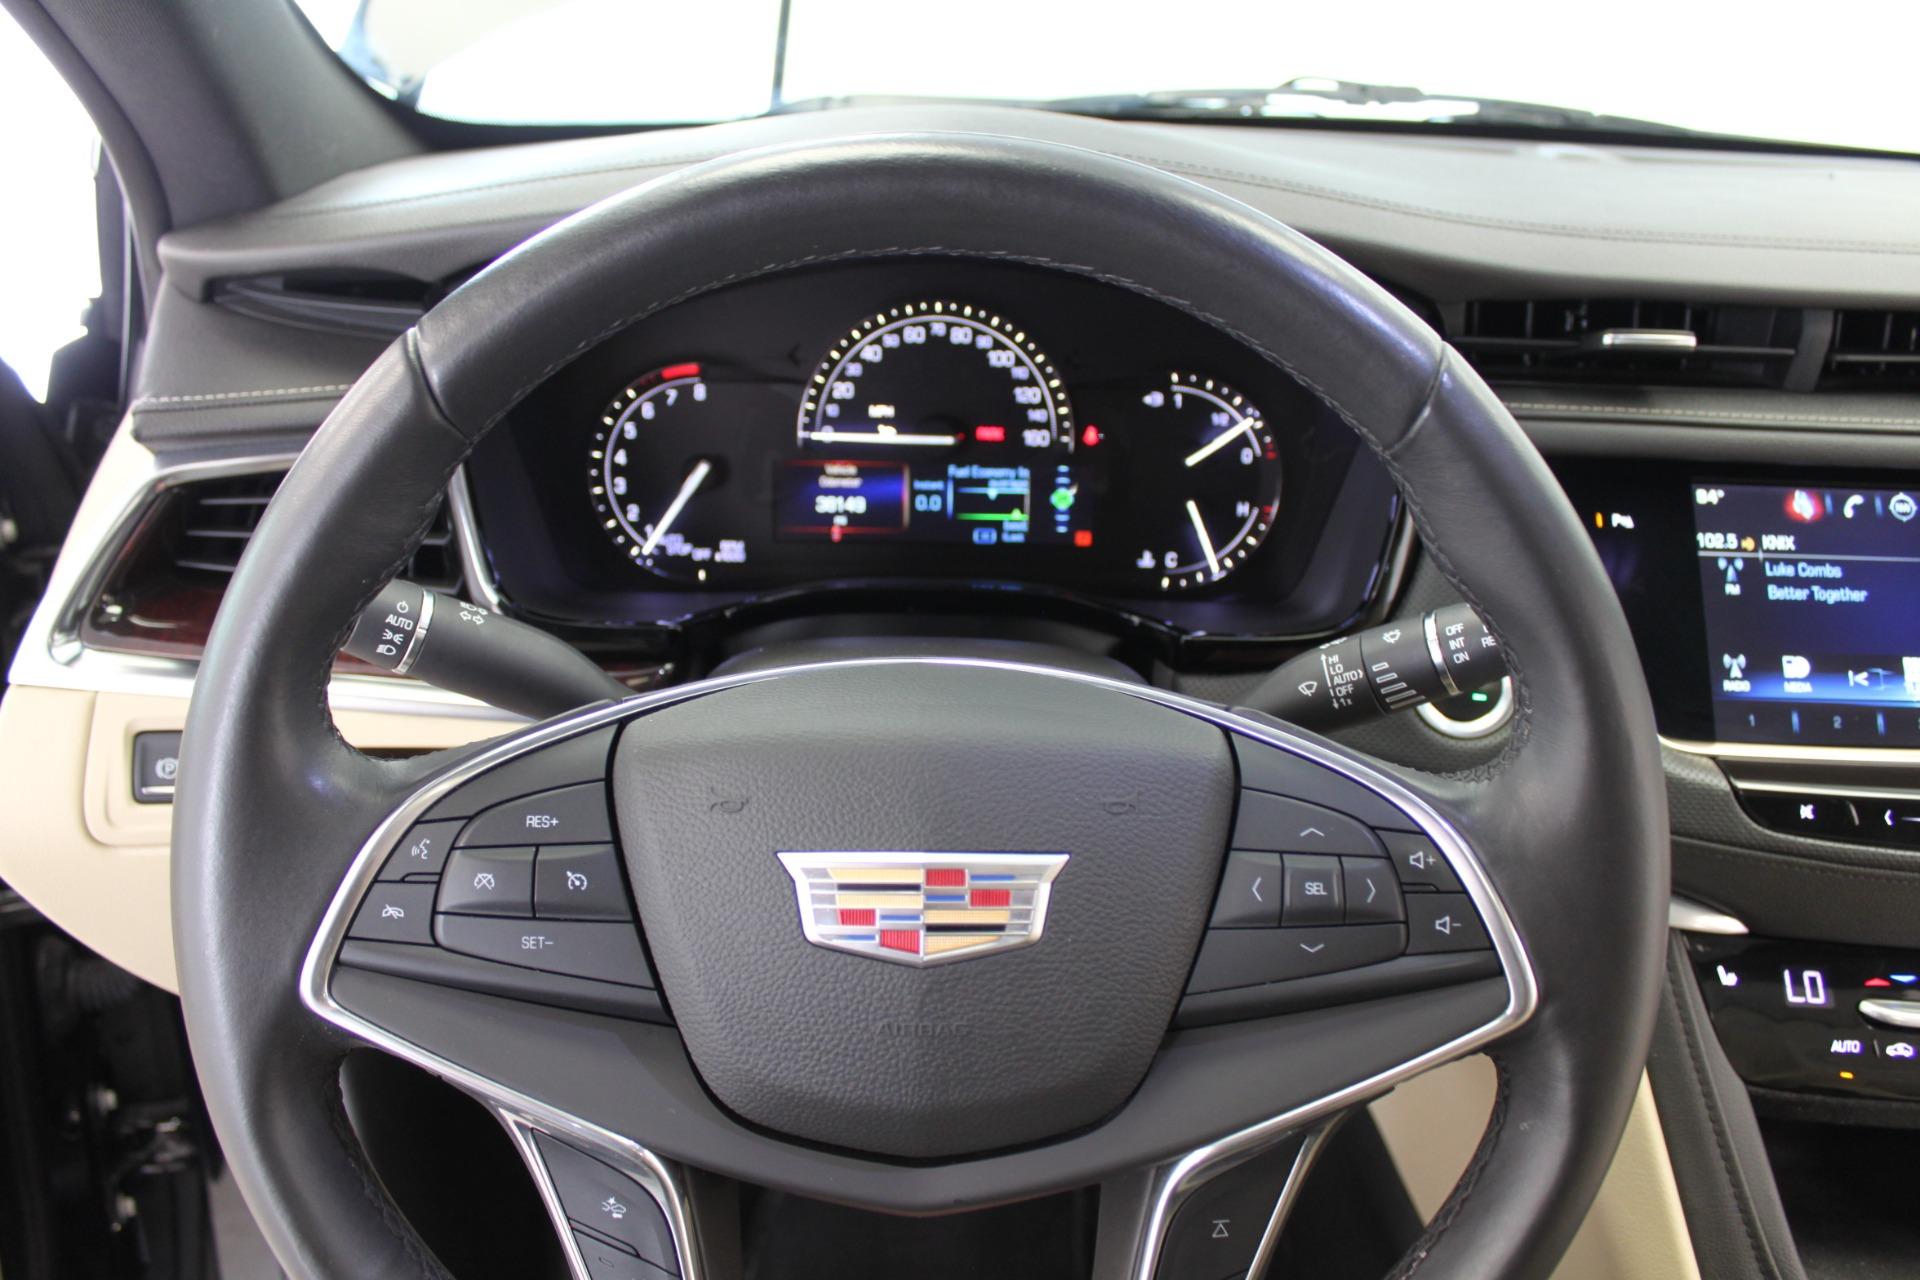 Used-2017-Cadillac-XT5-Luxury-All-Wheel-Drive-Luxury-AWD-vintage